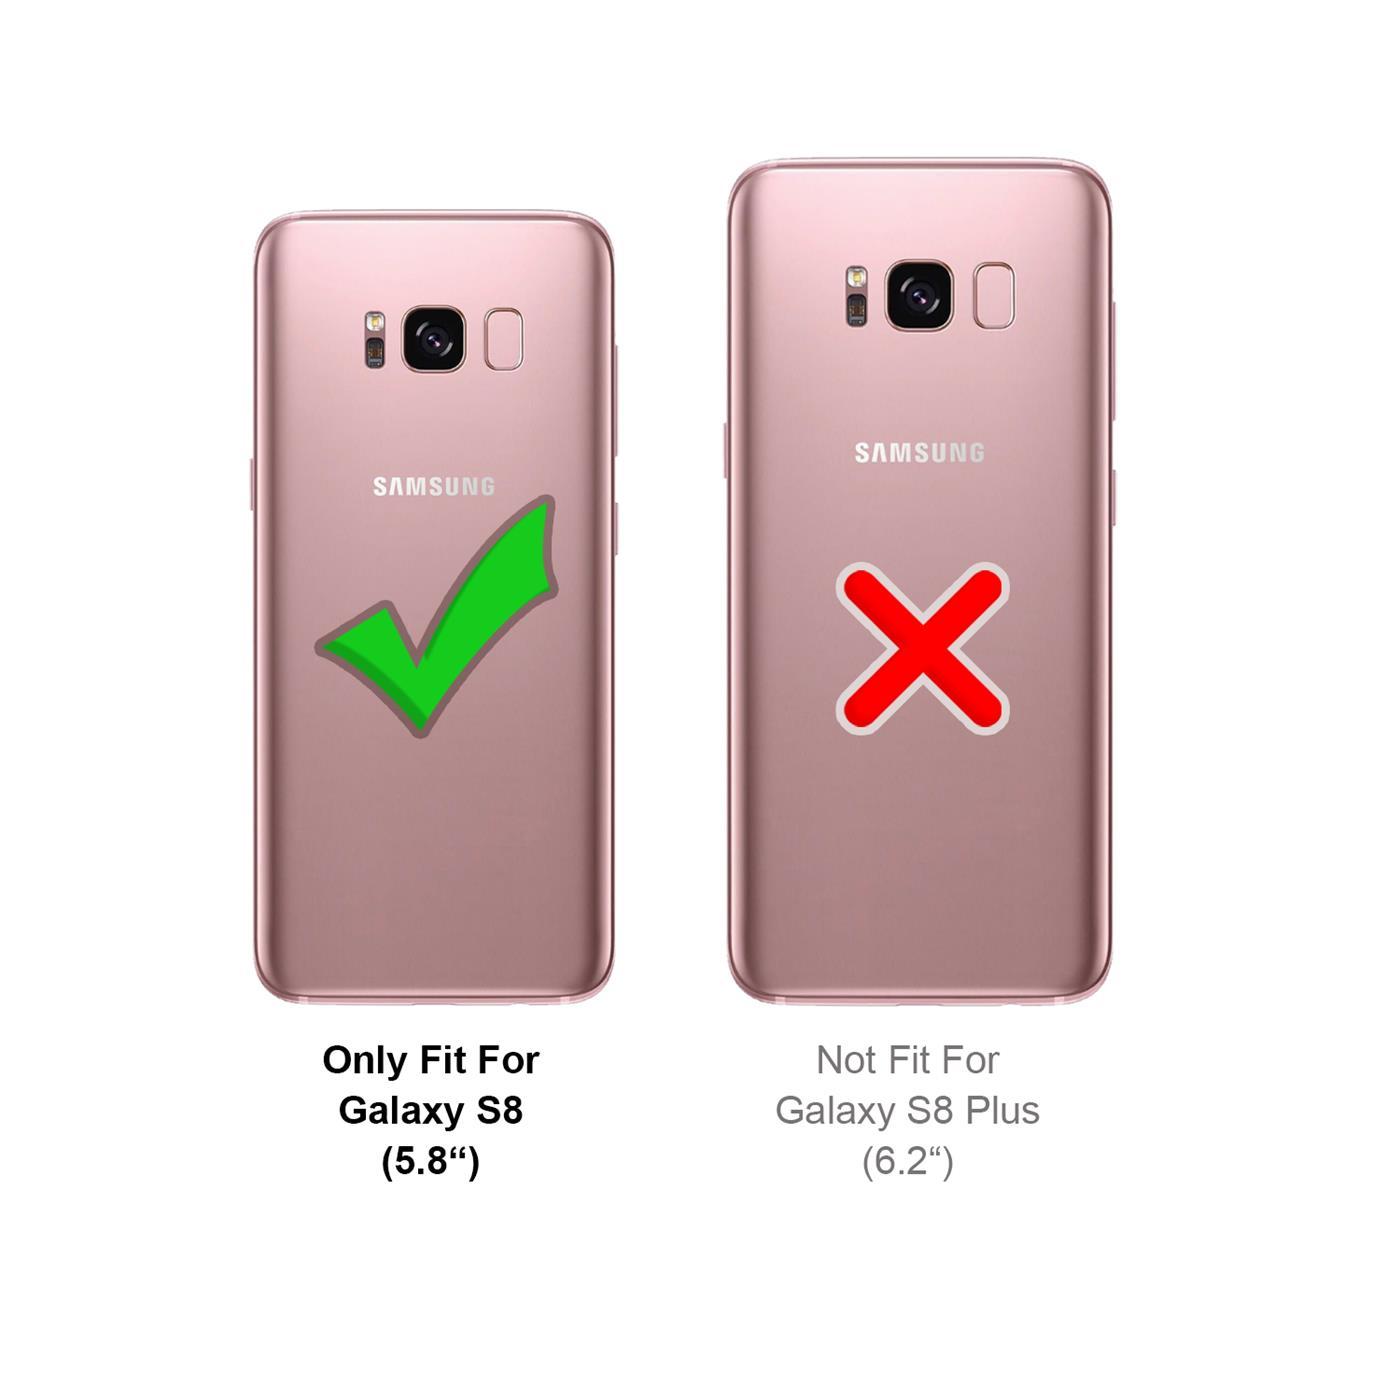 Hard-Back-Case-Cover-Samsung-Galaxy-j3-2016-duenn-Cover-Slim-Shockproof-Rugged Indexbild 11